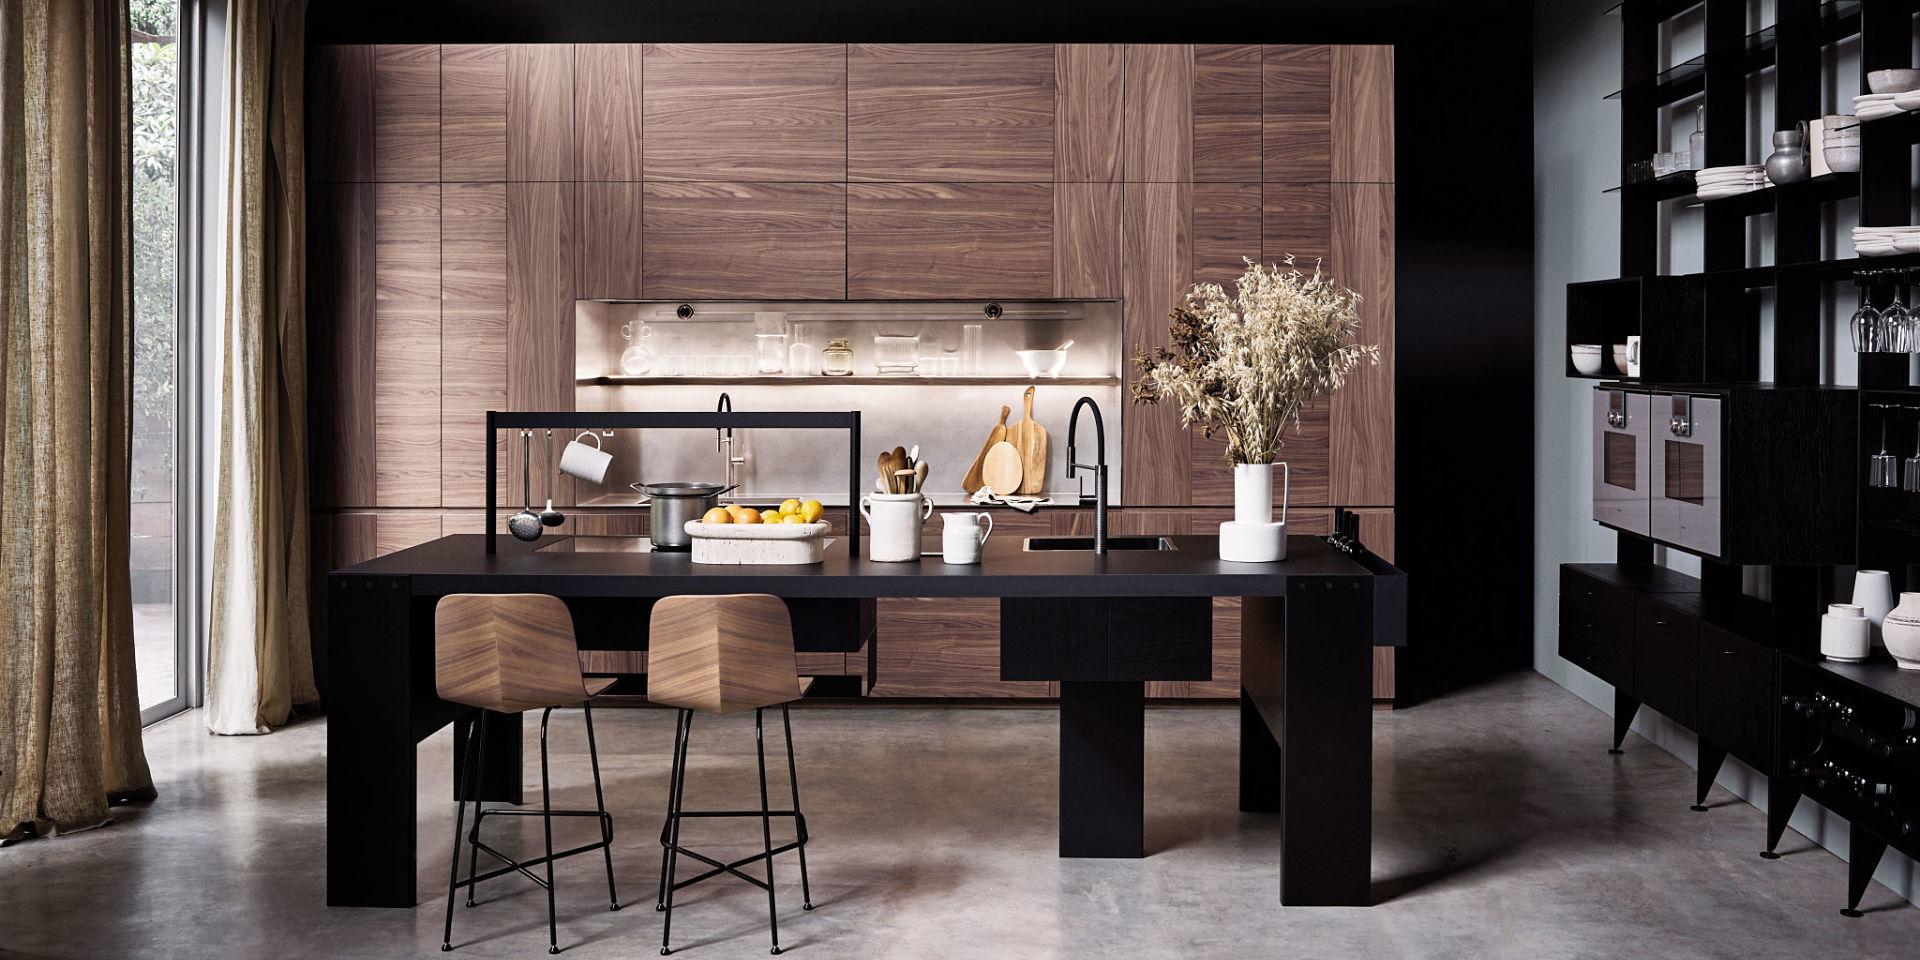 Cucina Cesar modello Intarsio